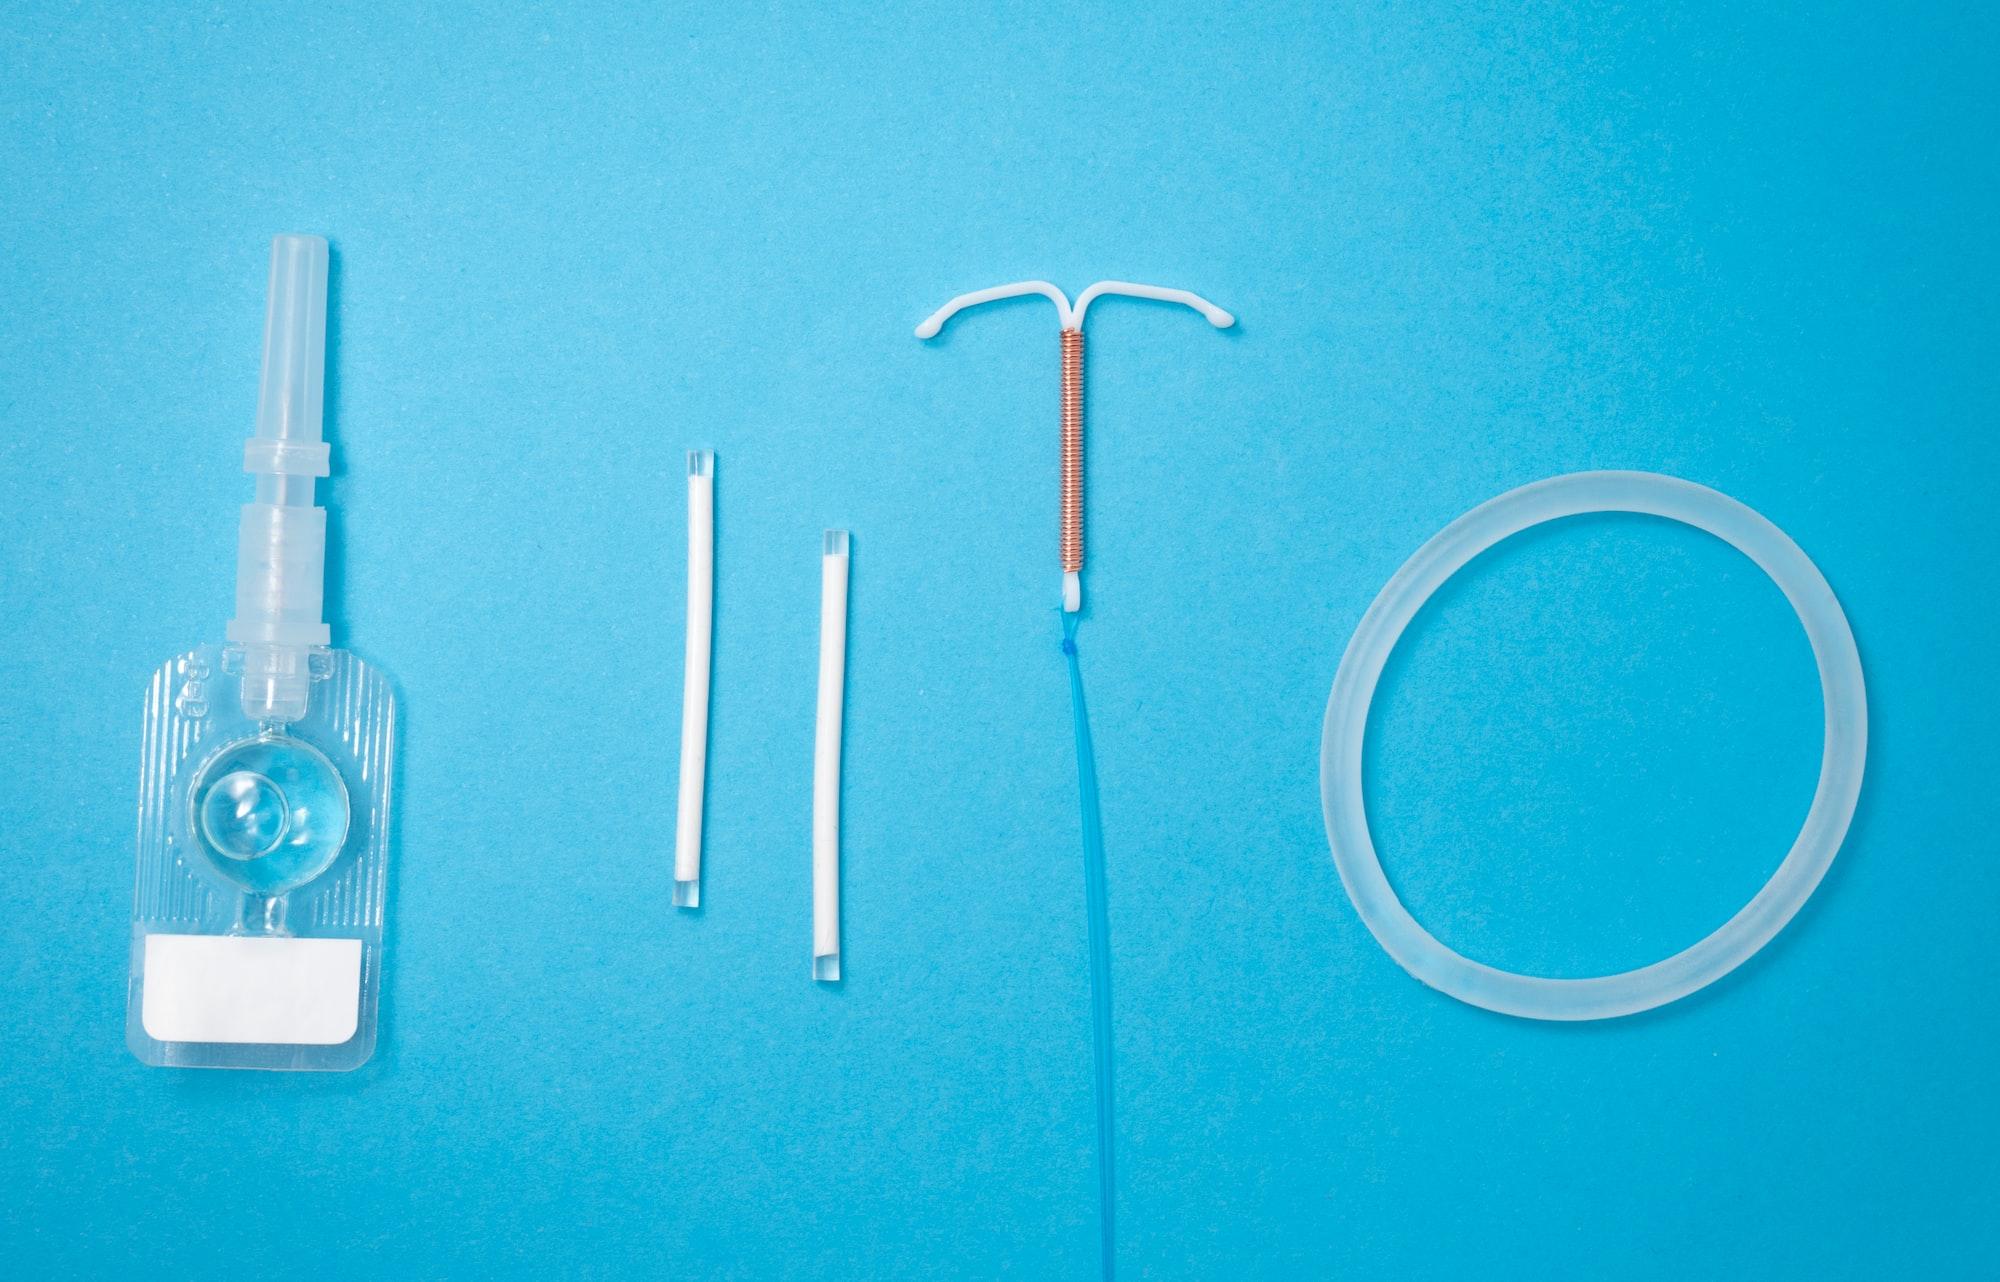 Contraceptive methods: DMPA, implants, IUD, vaginal ring